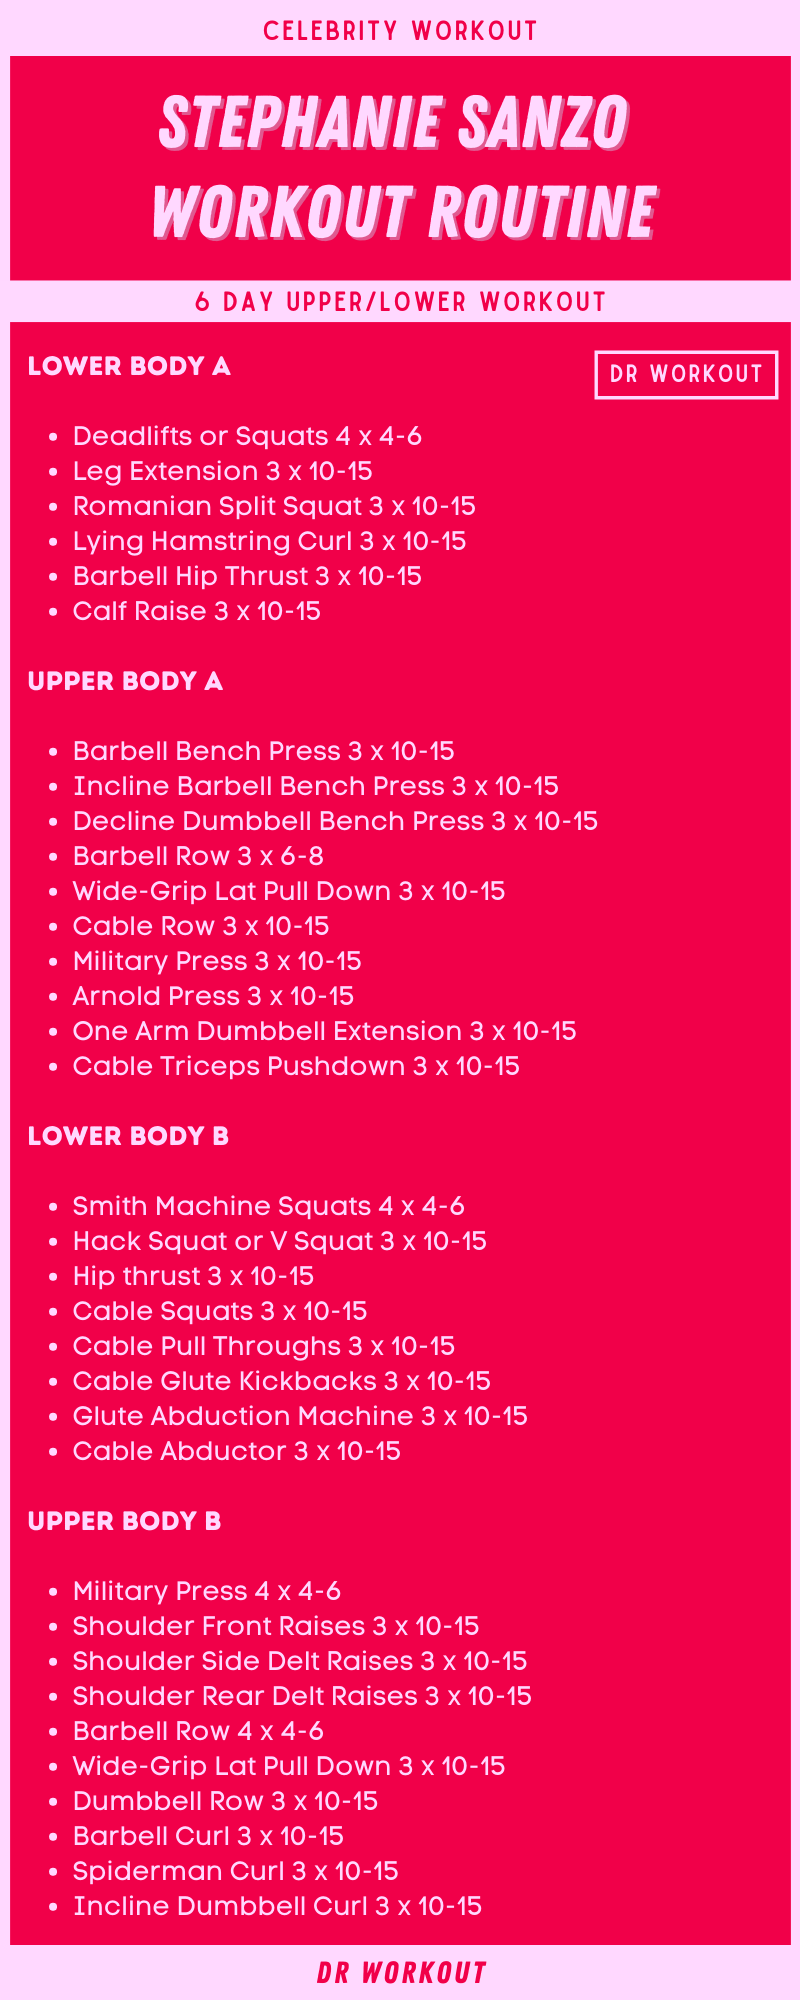 Stephanie Sanzo Workout Routine